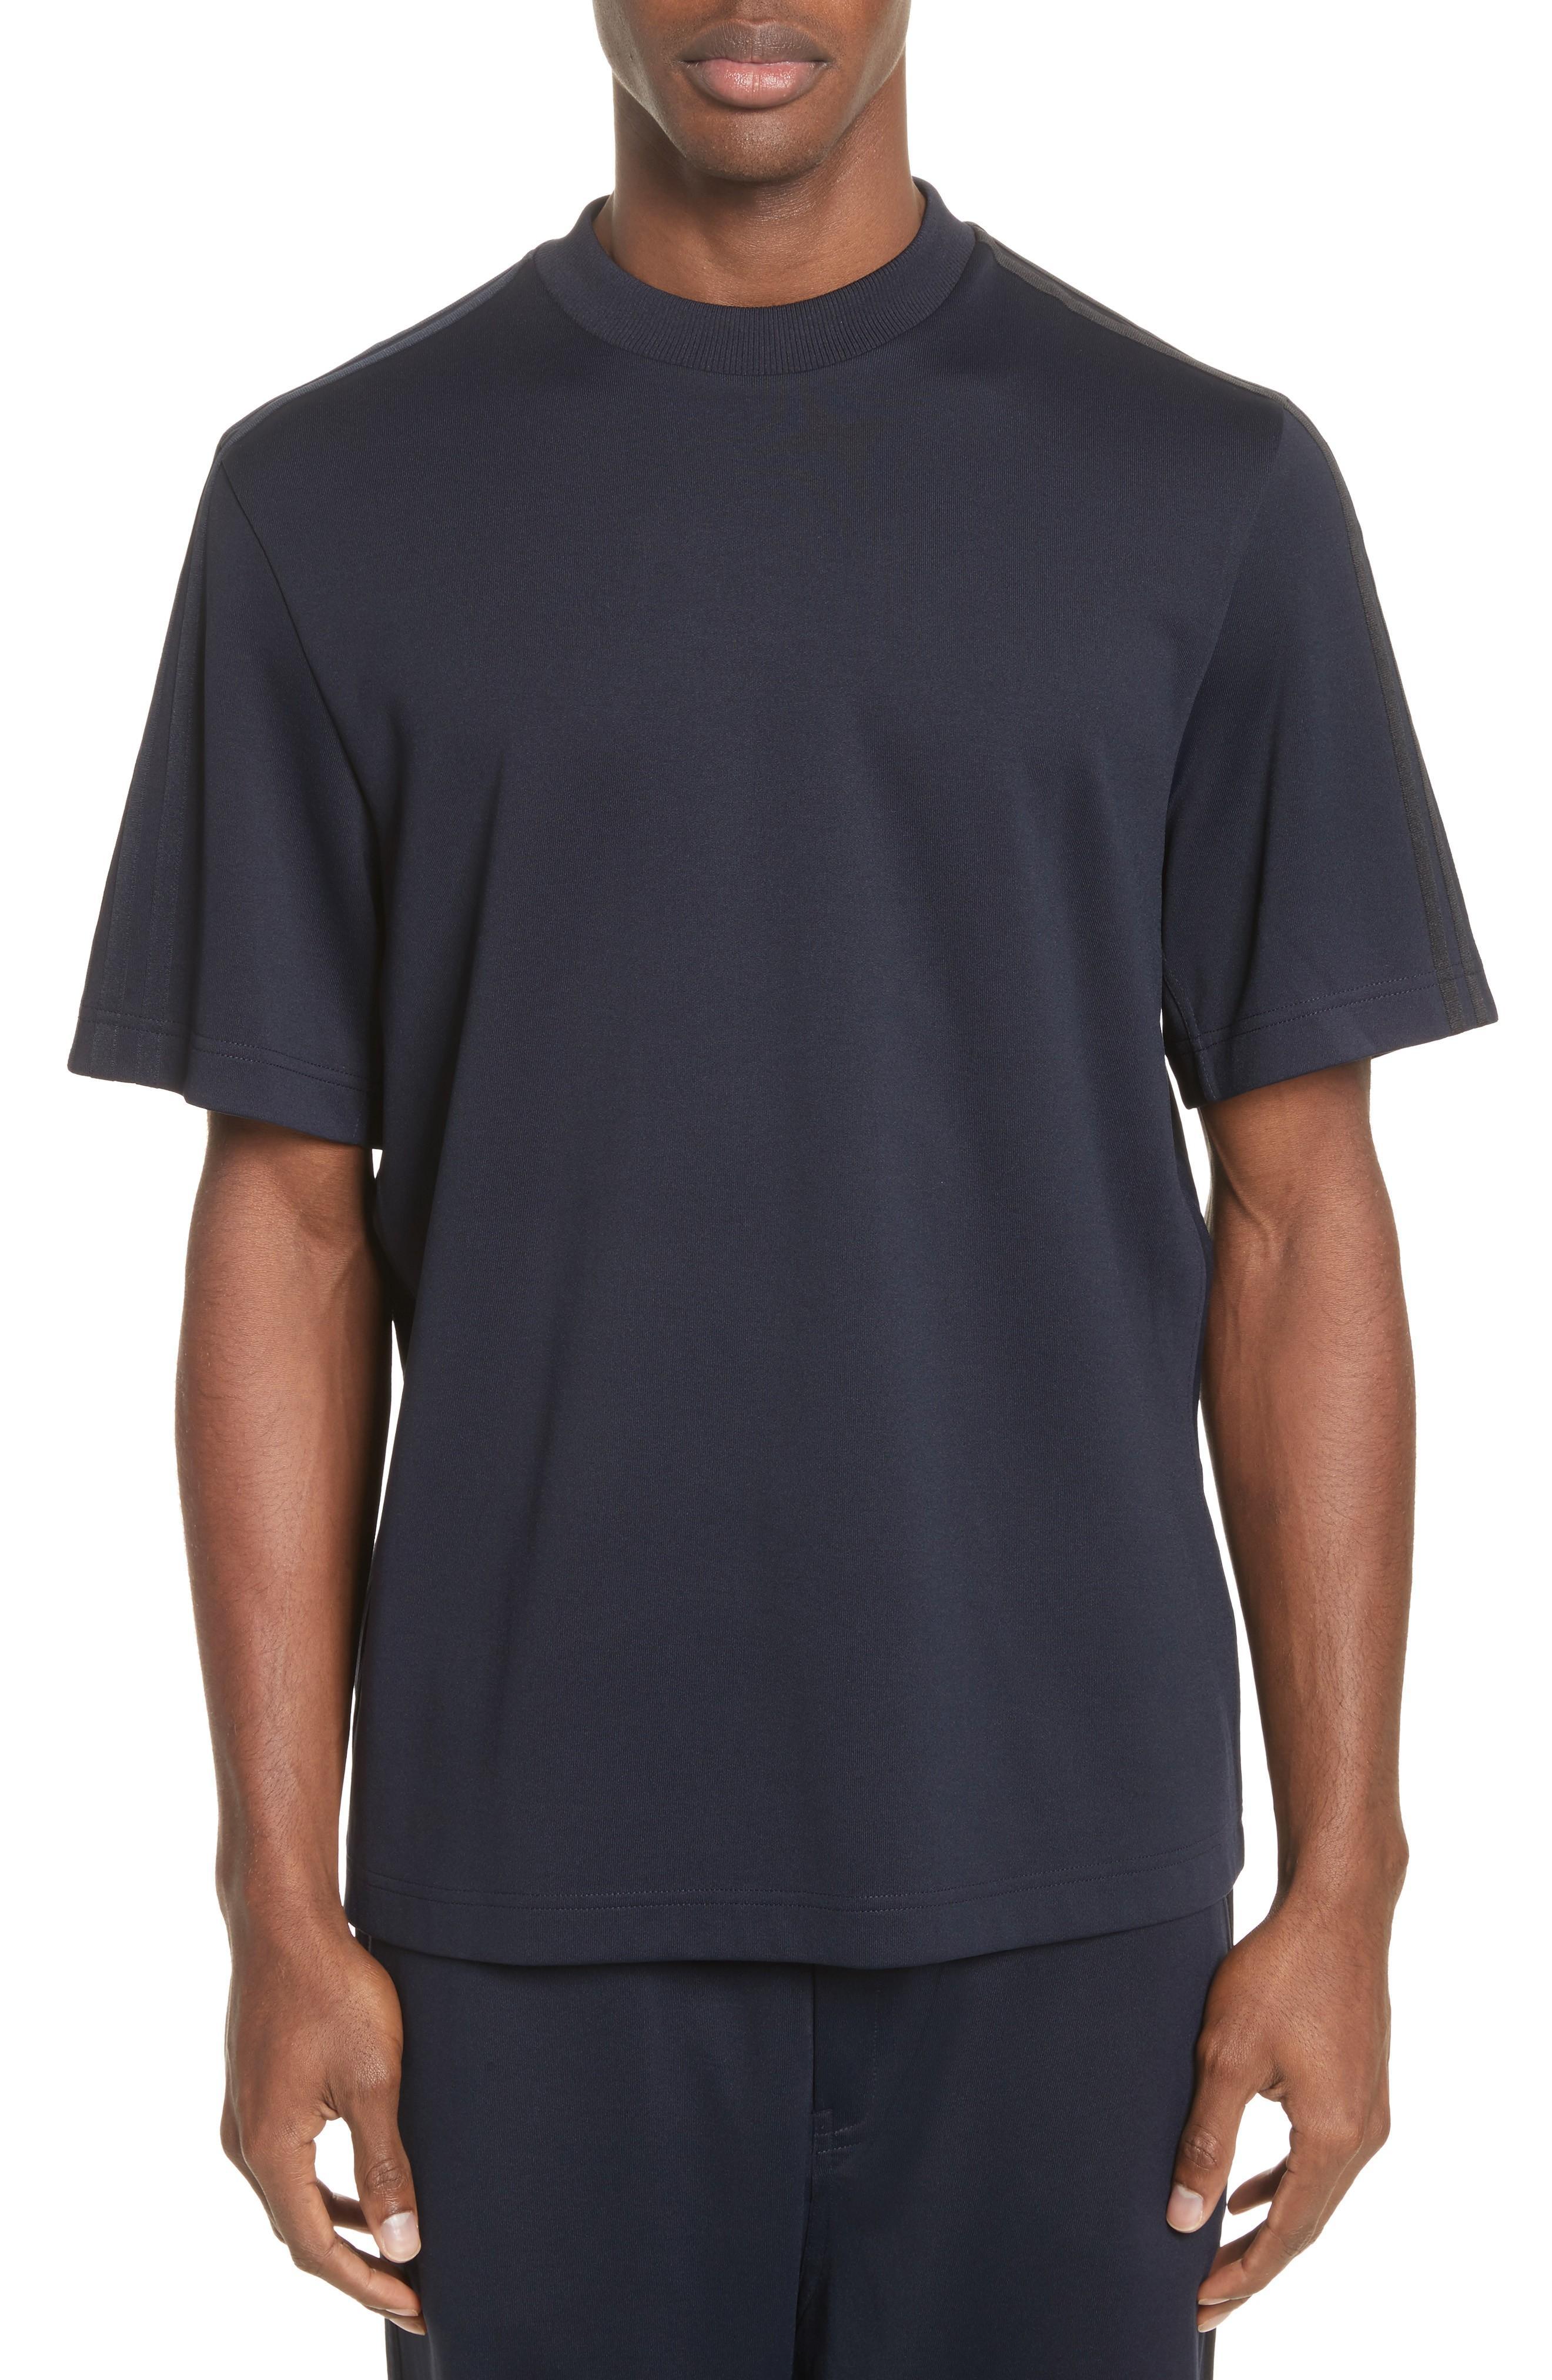 Y-3 X Adidas Tonal Stripe Crewneck T-shirt In Navy